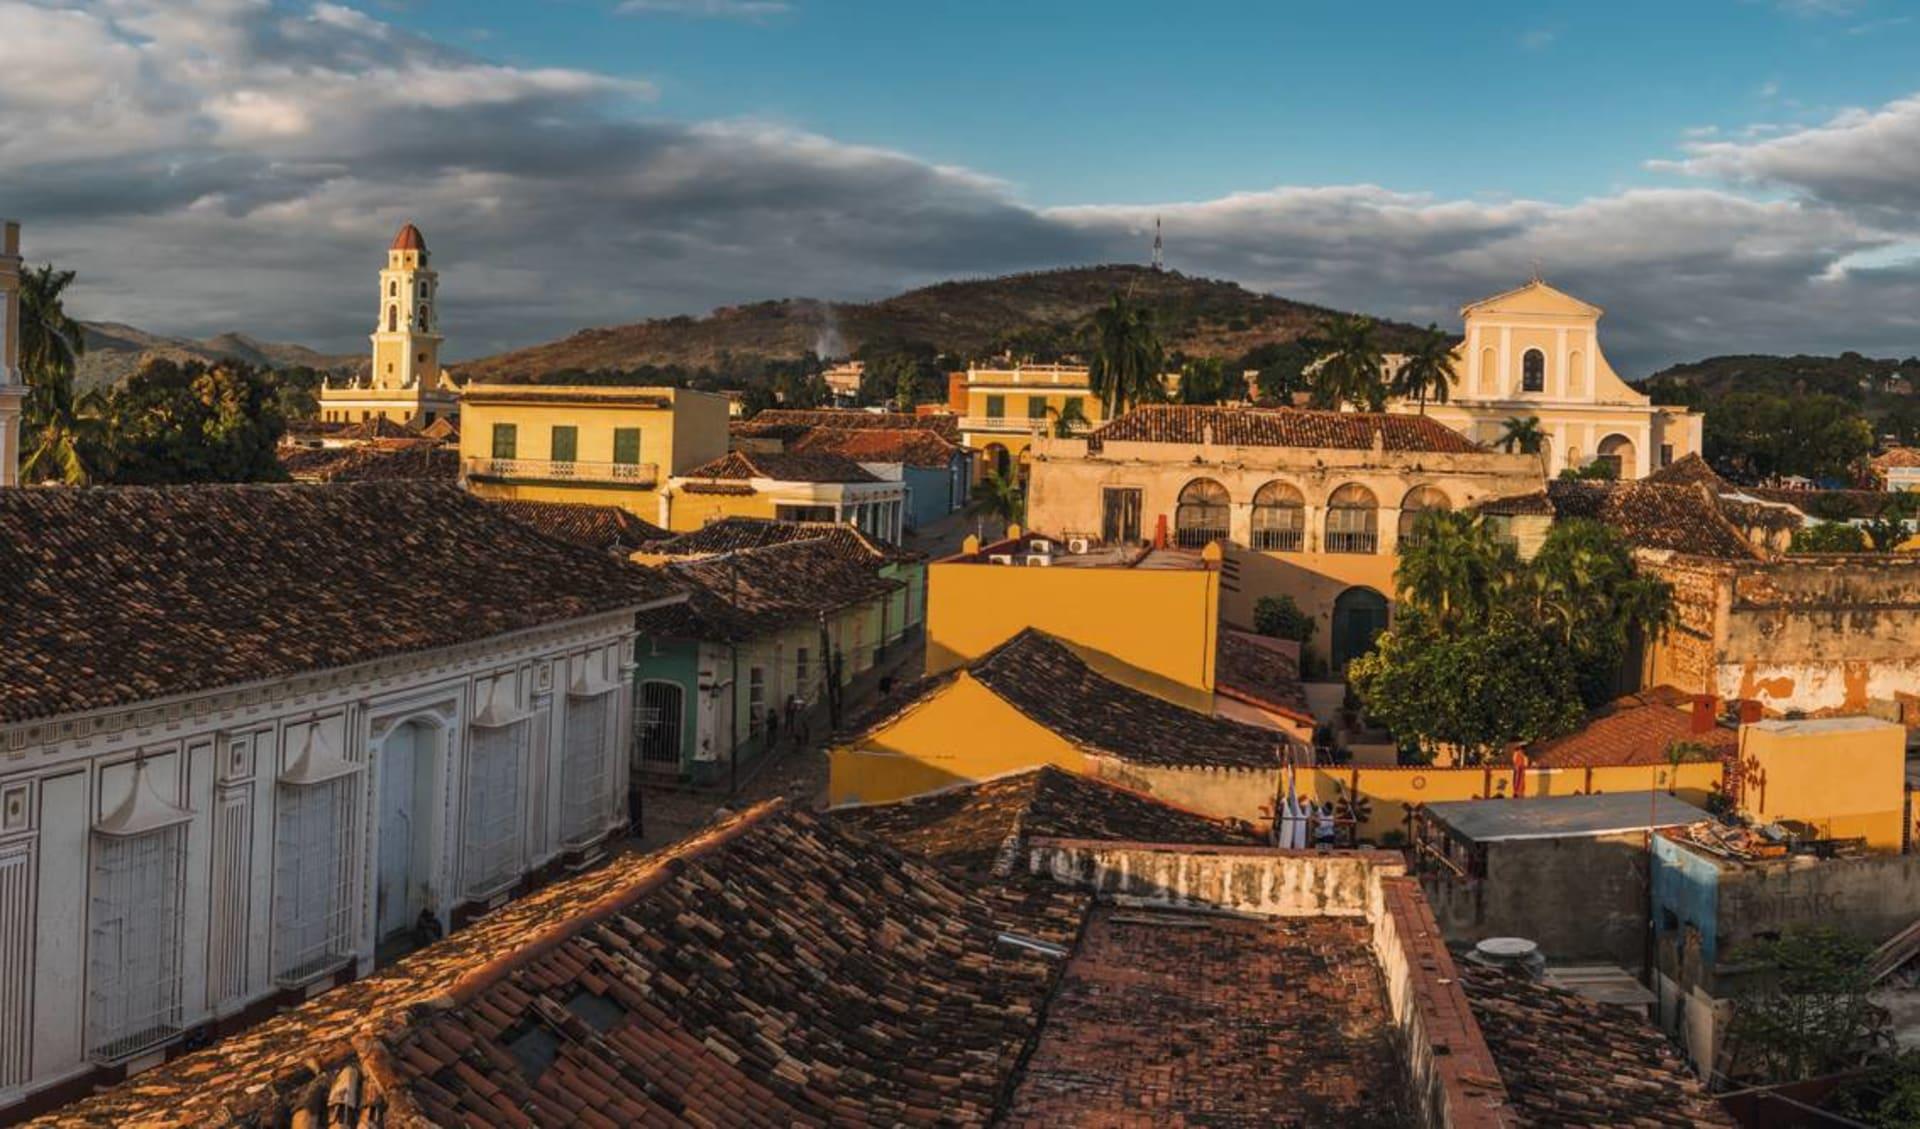 Cuba von West nach Ost ab Havanna: Stadt Trinidad - Panorama Trinidad - c